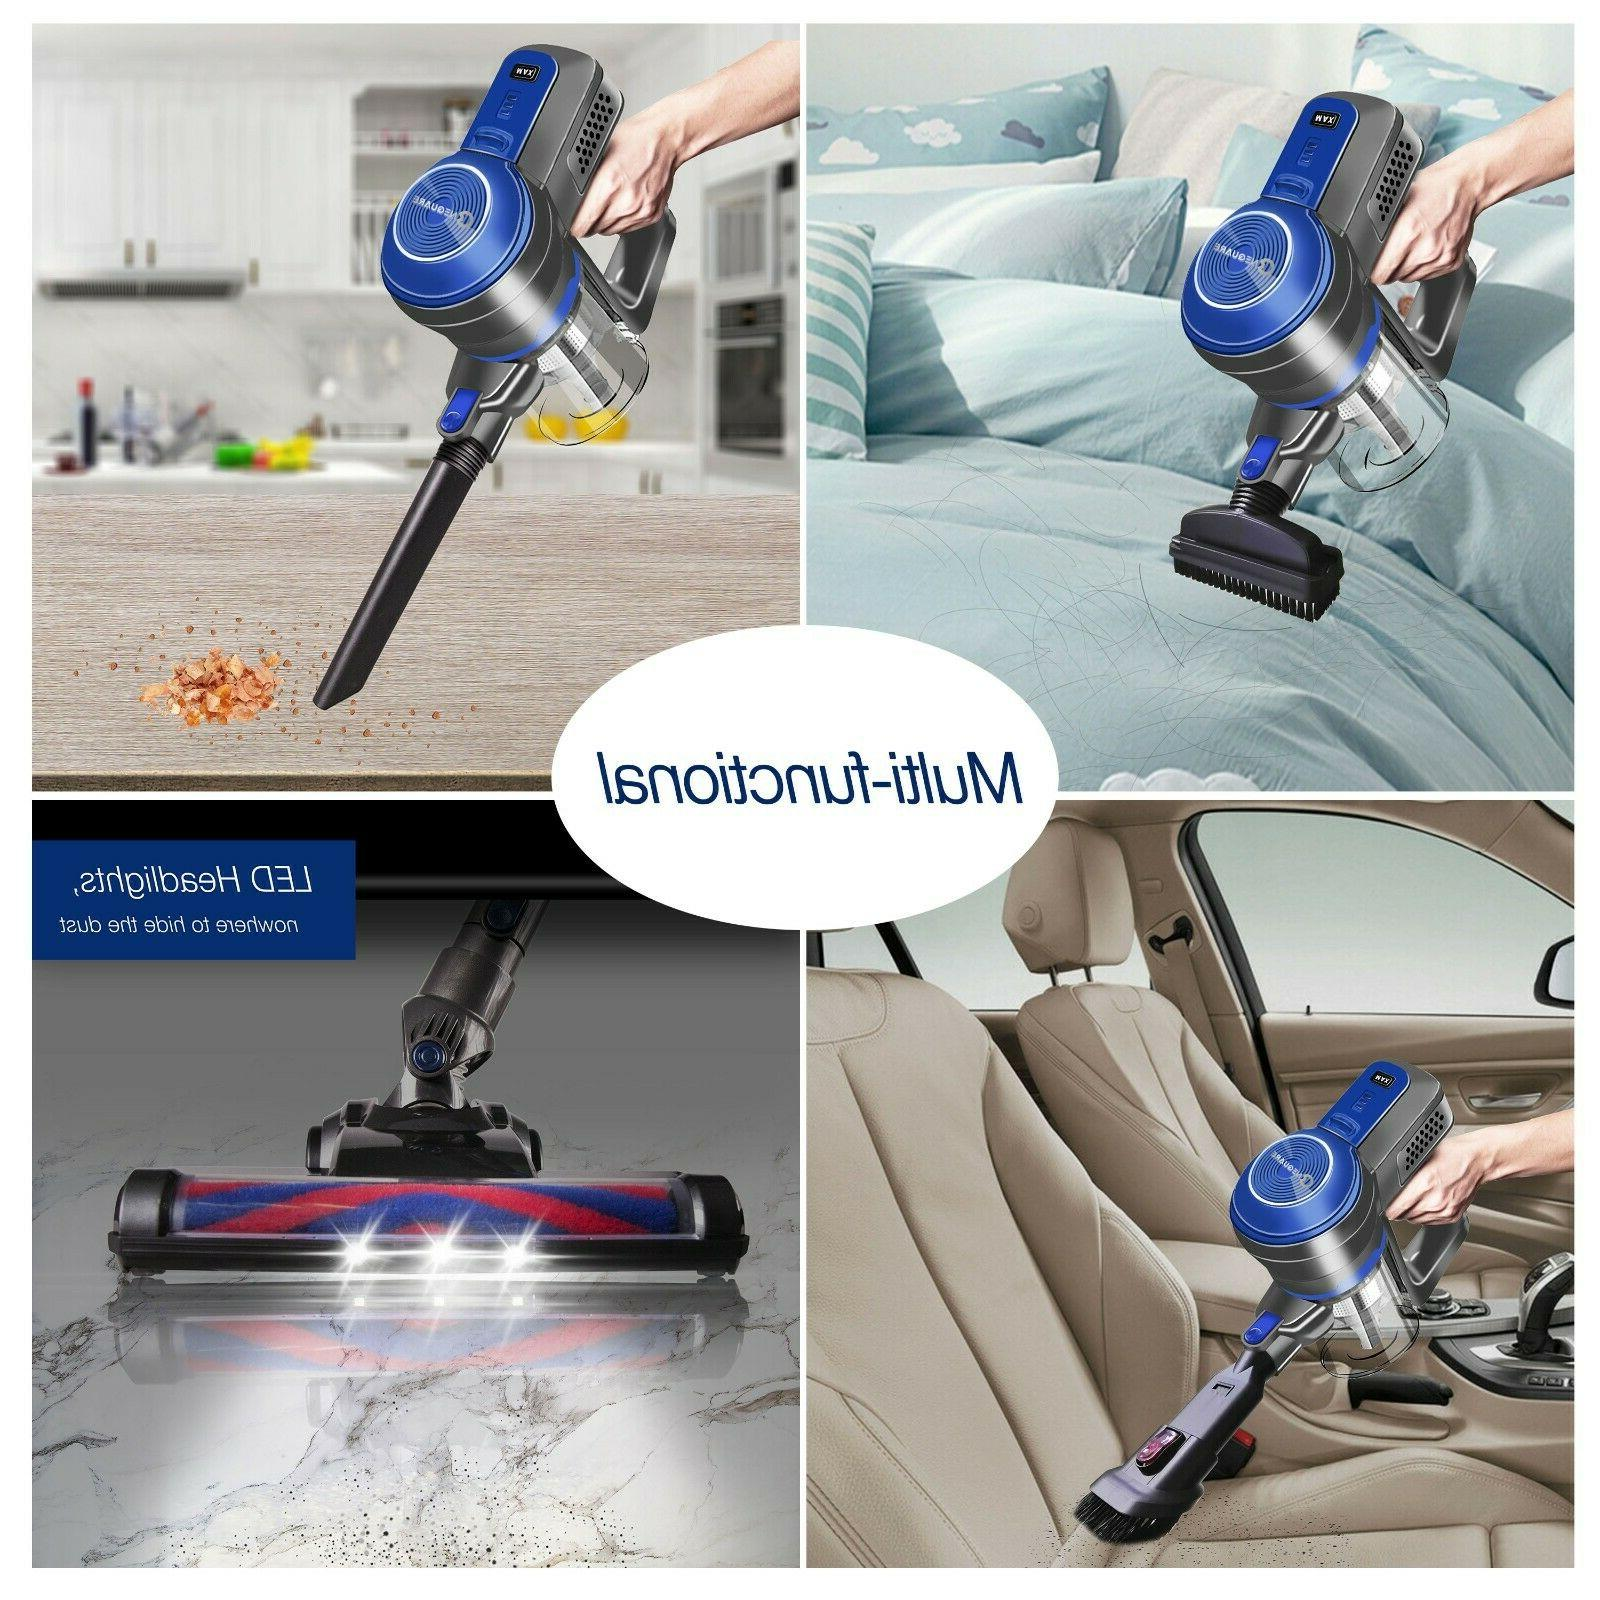 NEQUARE A18 18kPa Handheld Lightweight Home & Cordless Cleaner